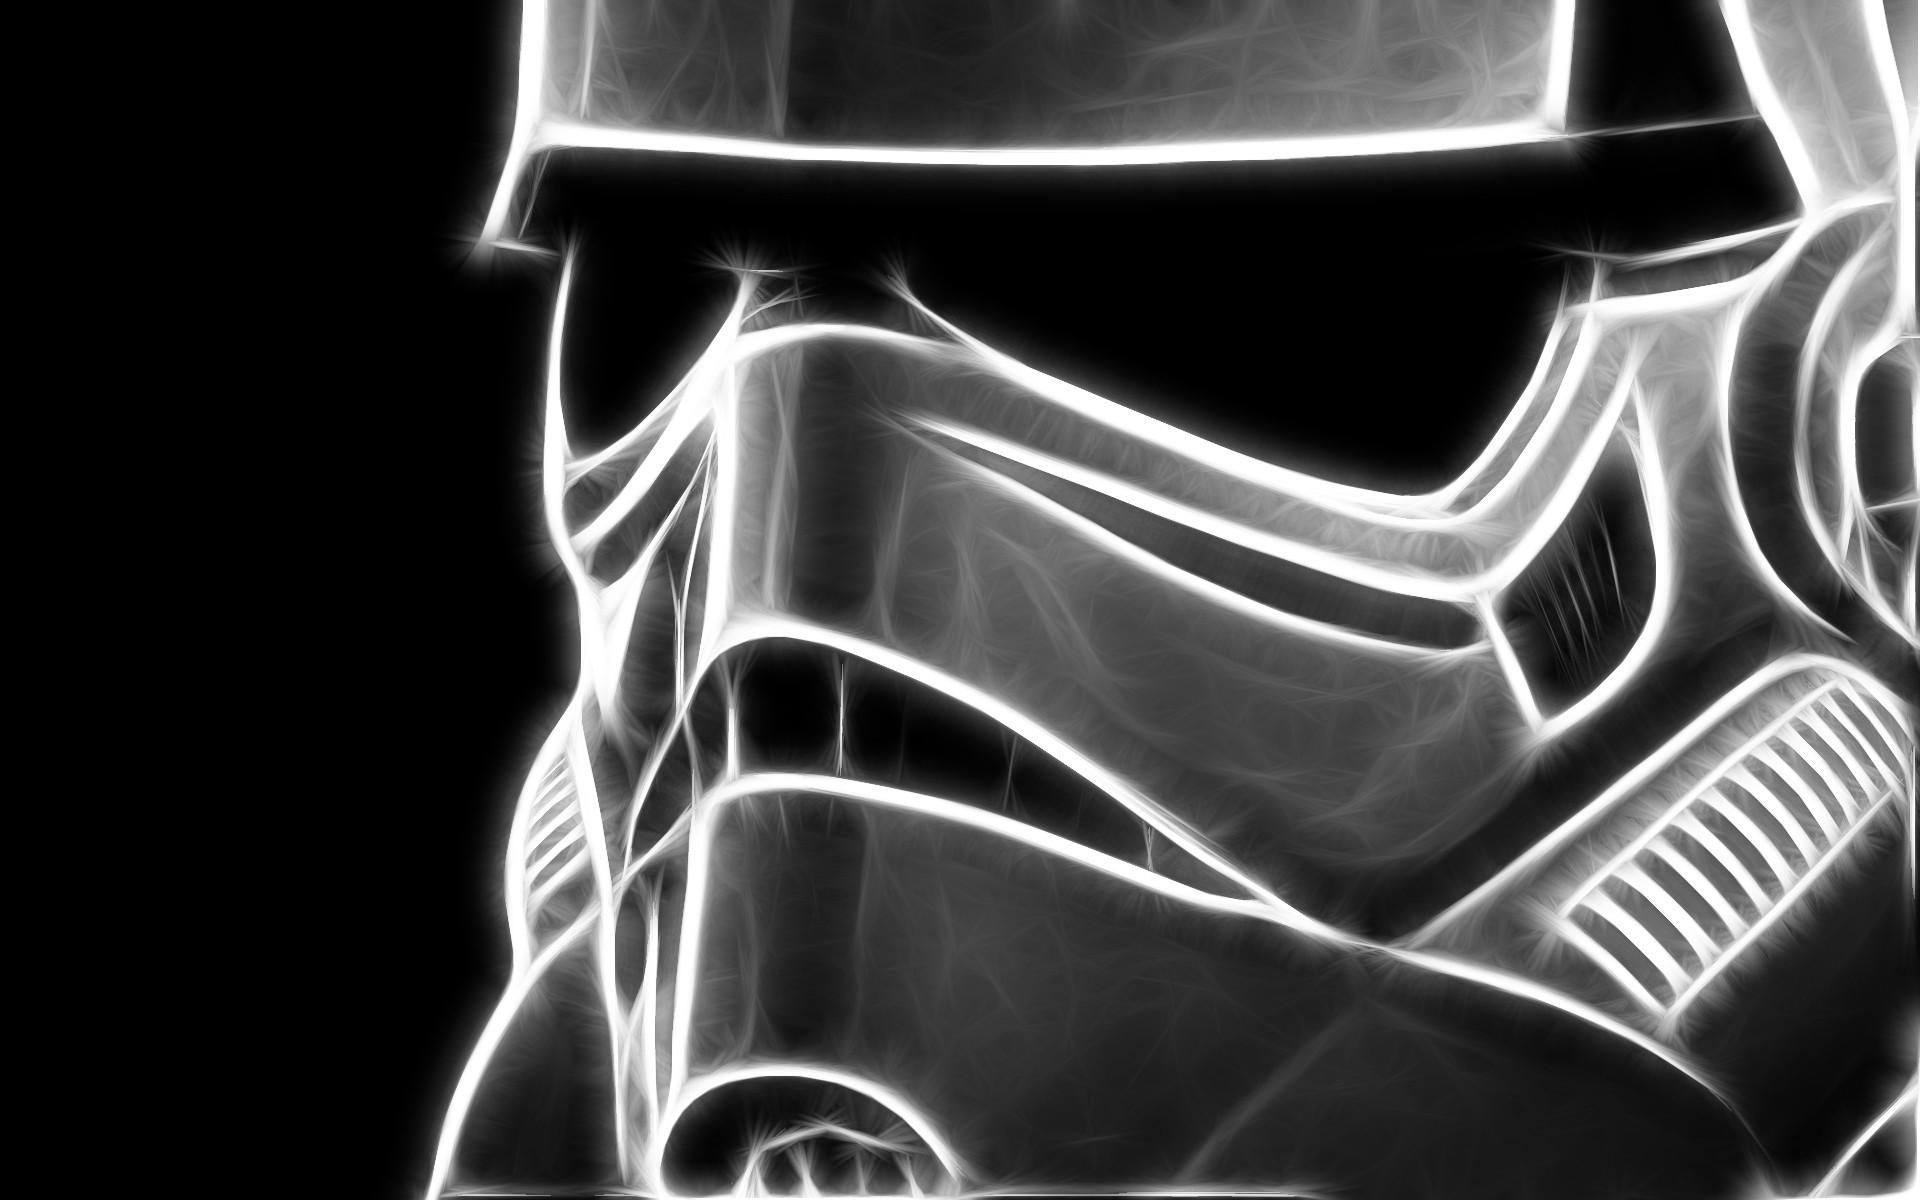 Res: 1920x1200, 10 Latest Star Wars Stormtrooper Wallpaper Hd FULL HD 1080p For PC Desktop  2018 free download